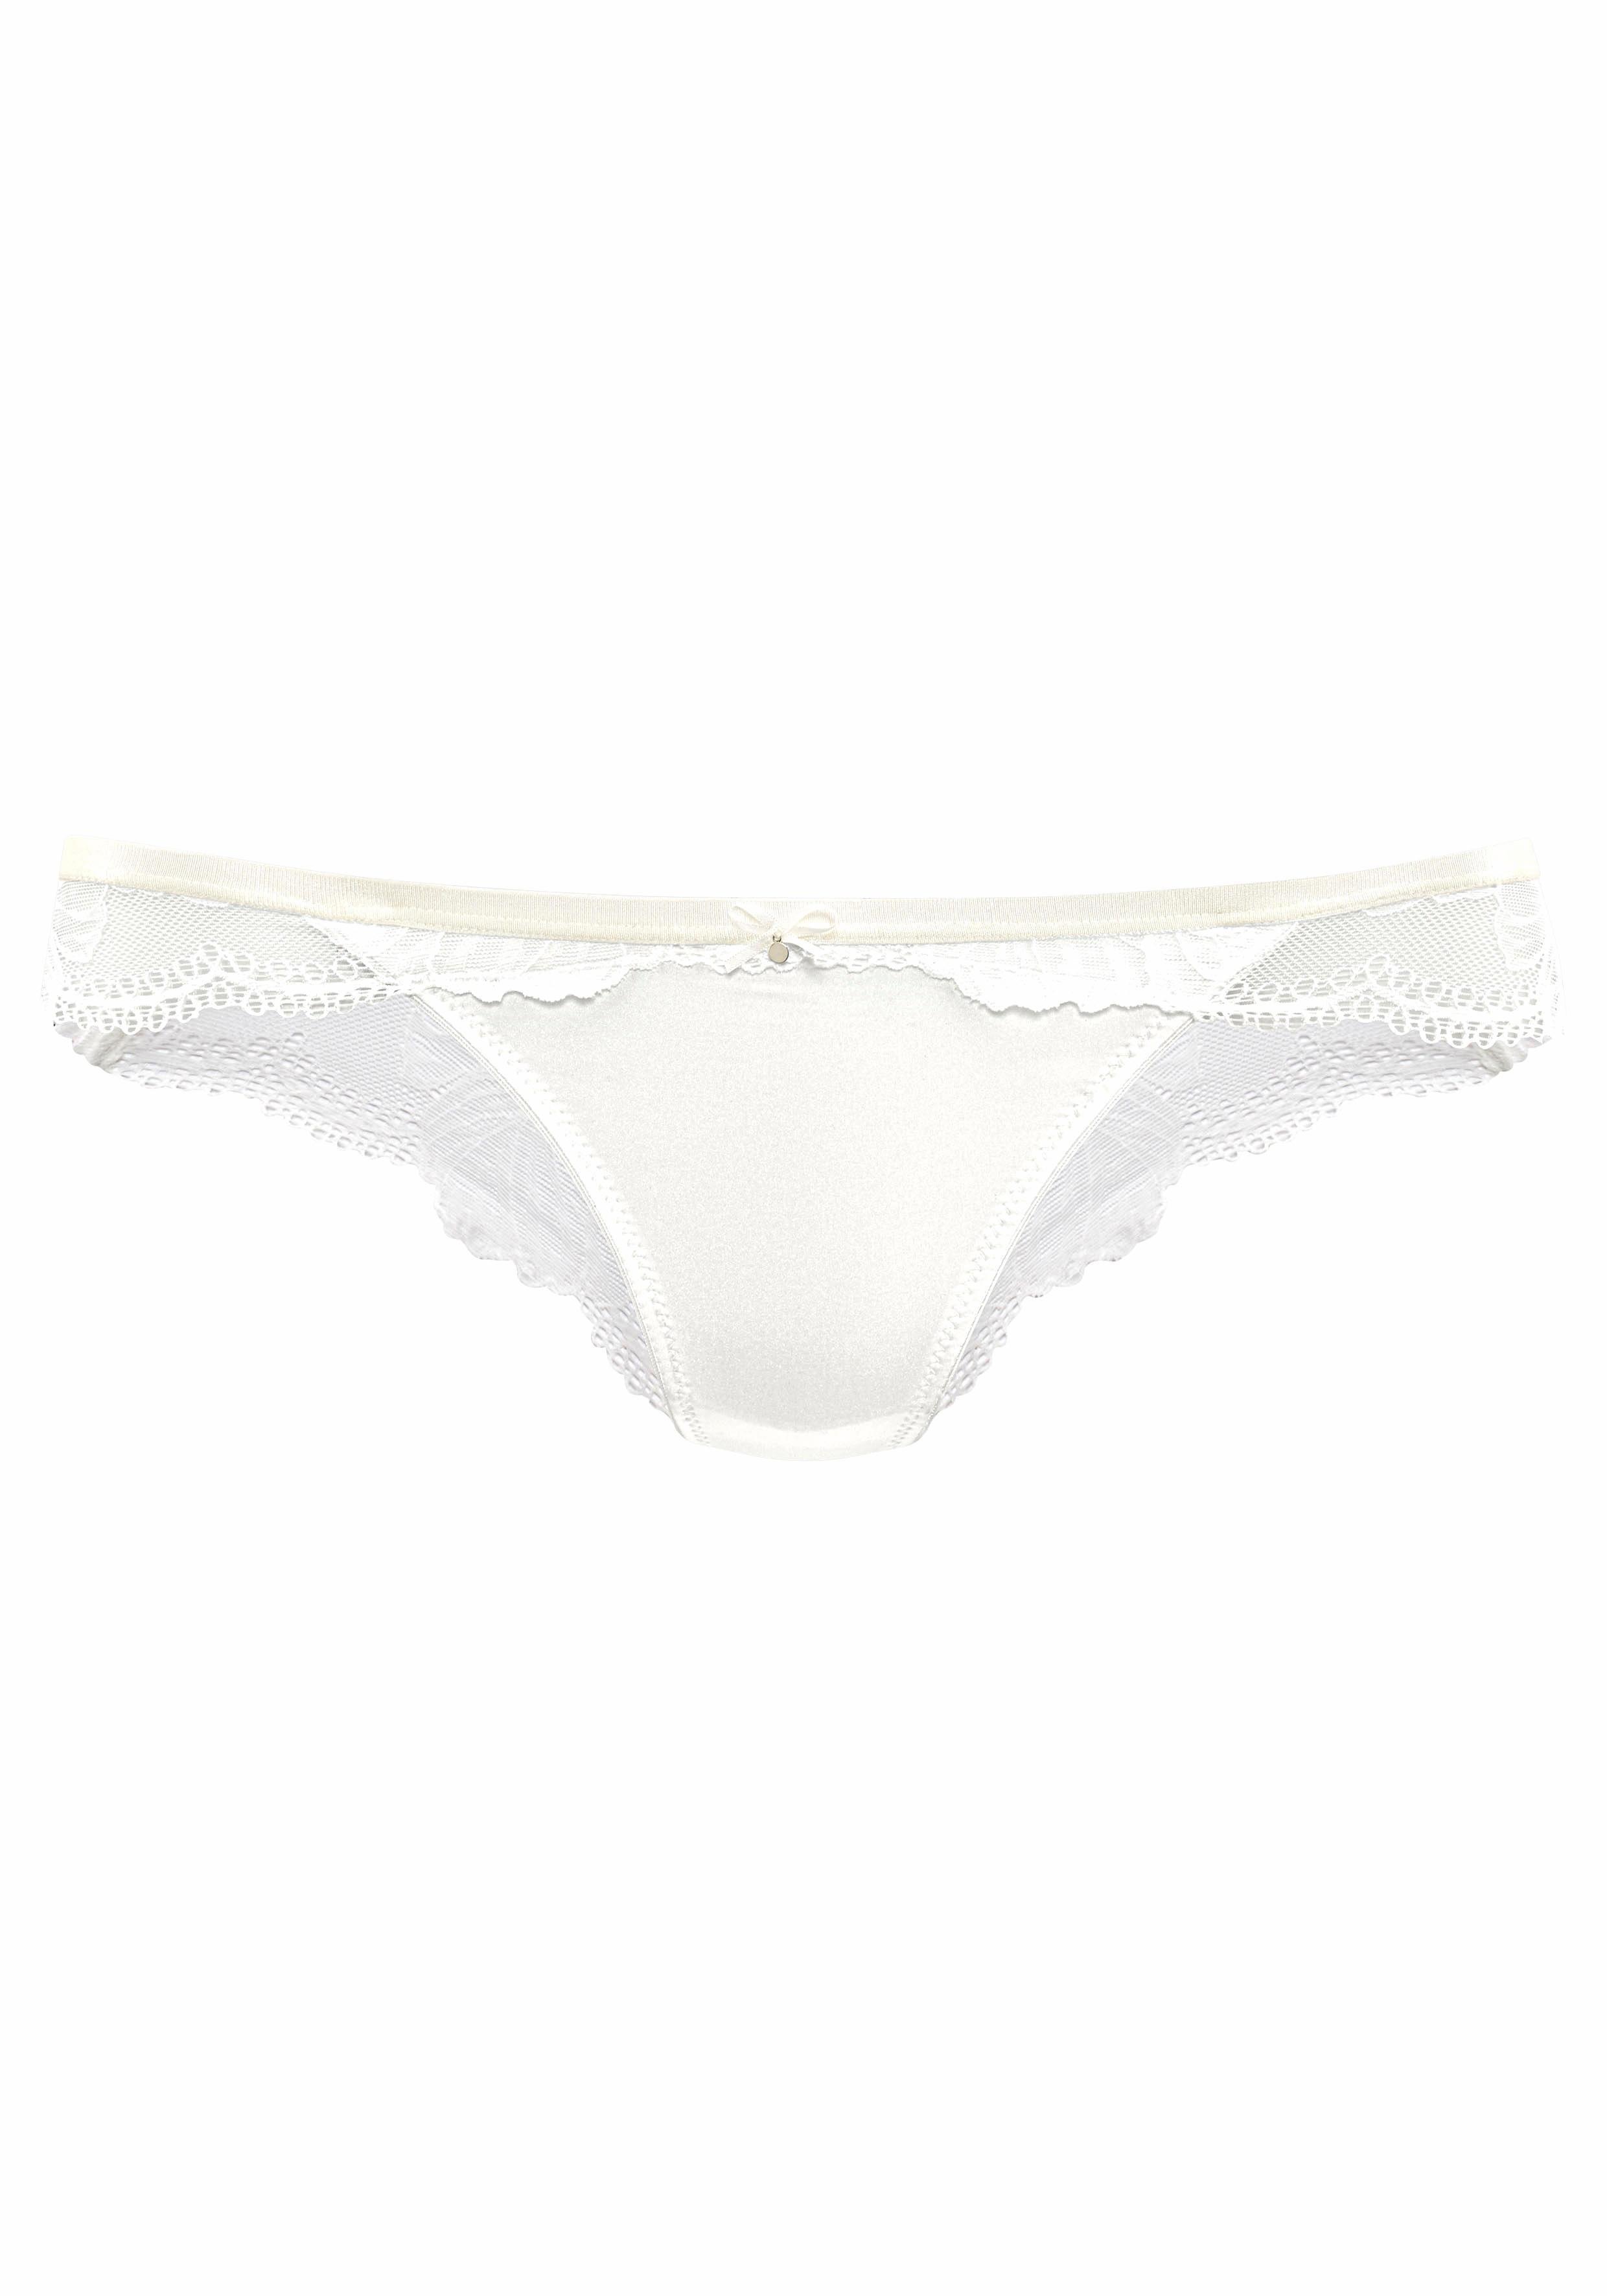 LASCANA stringpants nu online kopen bij Lascana